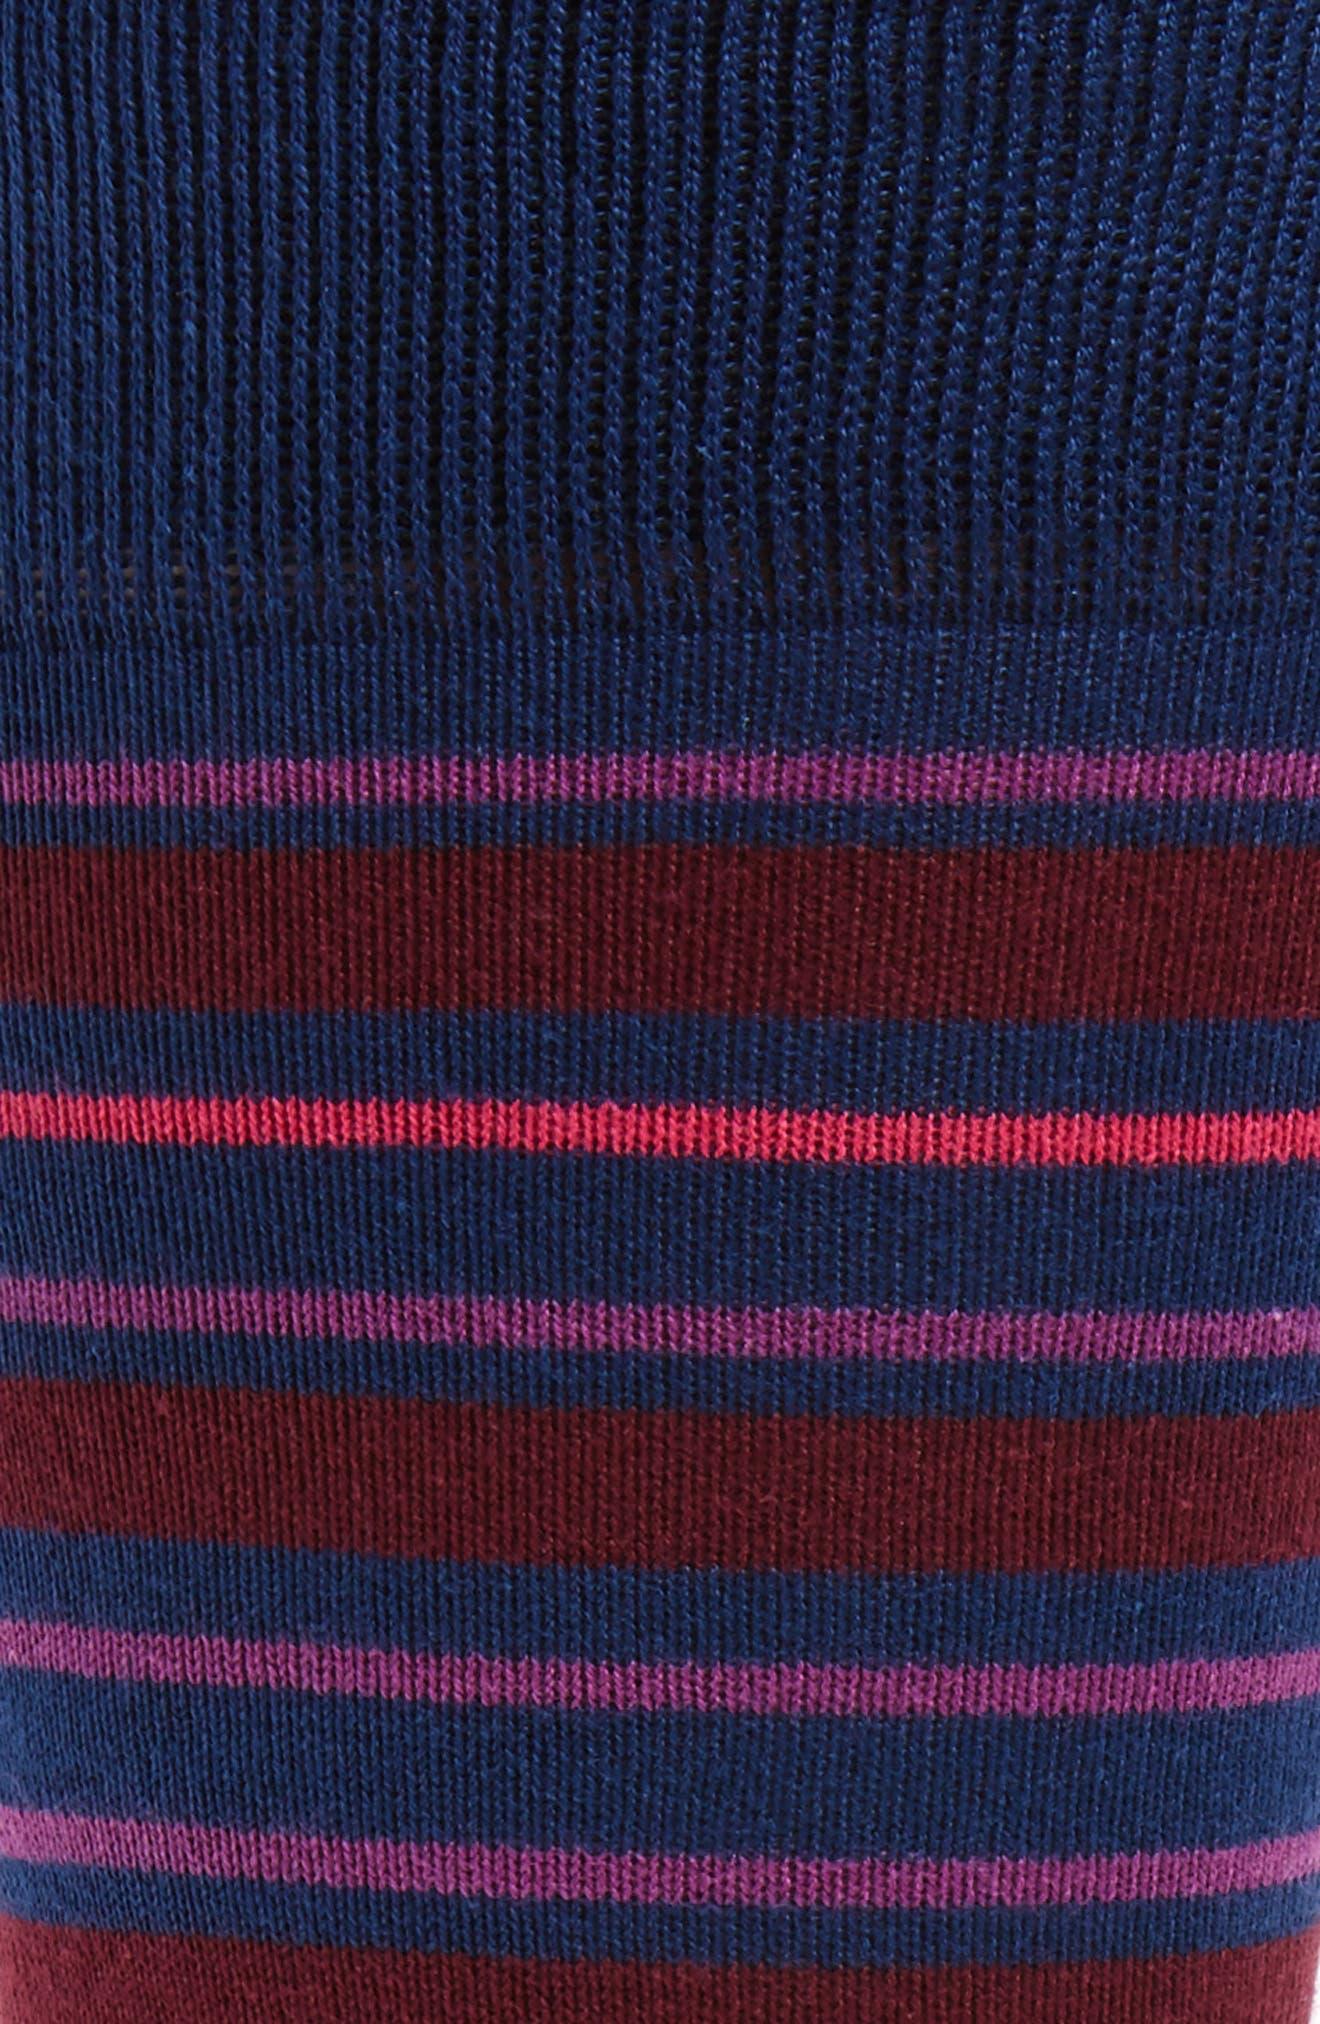 Alternate Image 2  - Paul Smith Fern Stripe Socks